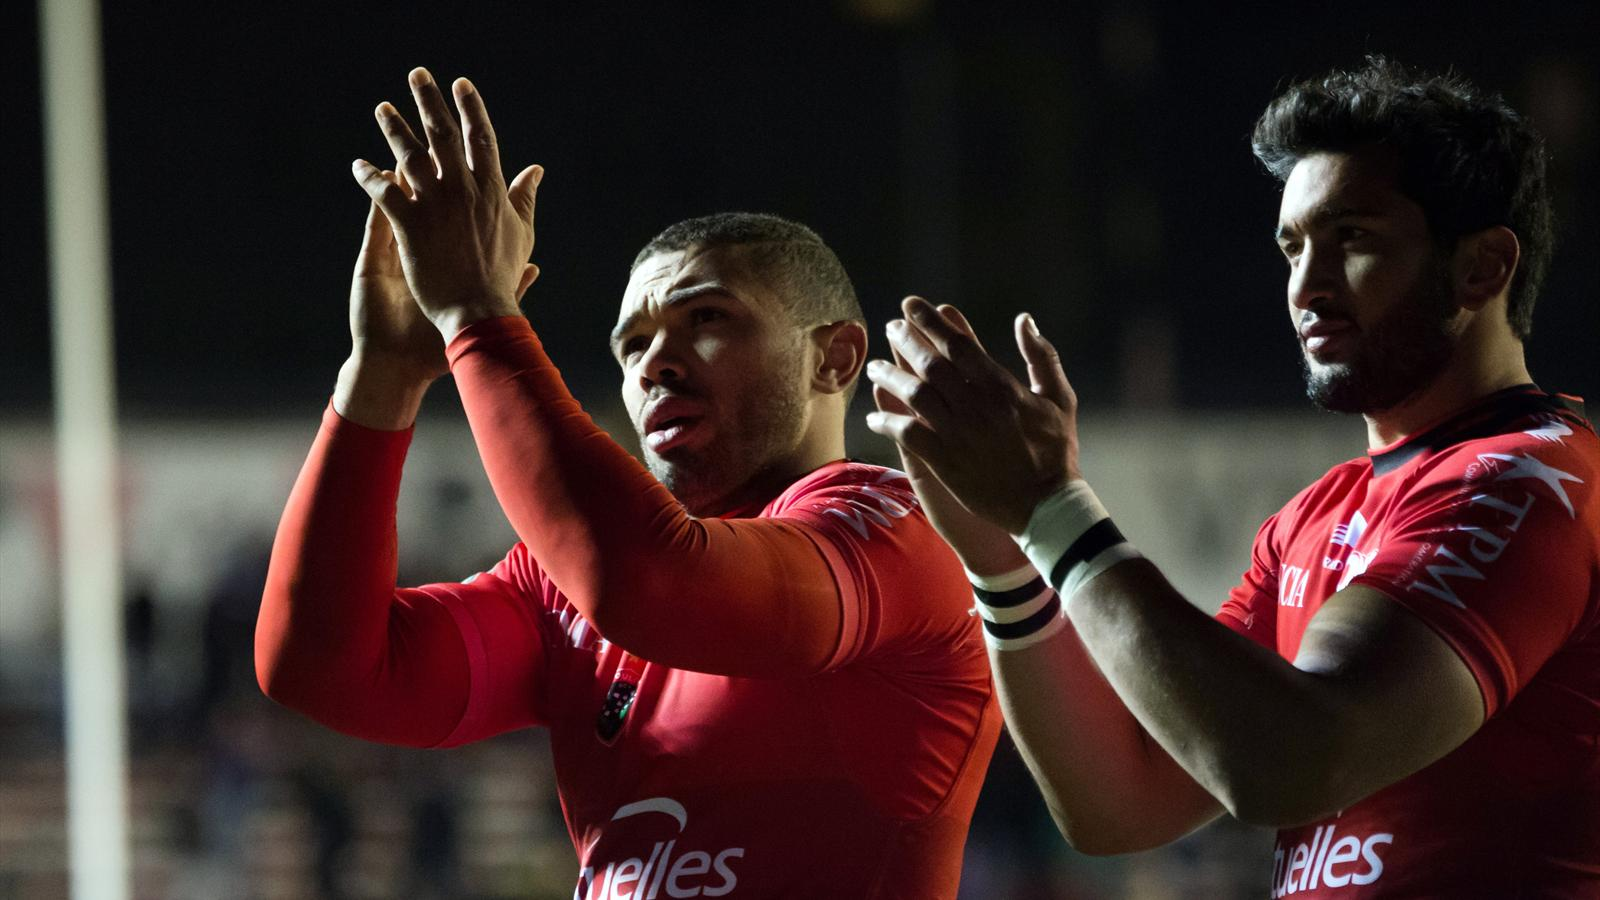 Bryan Habana et Maxime Mermoz (Toulon) - 17 janvier 2016